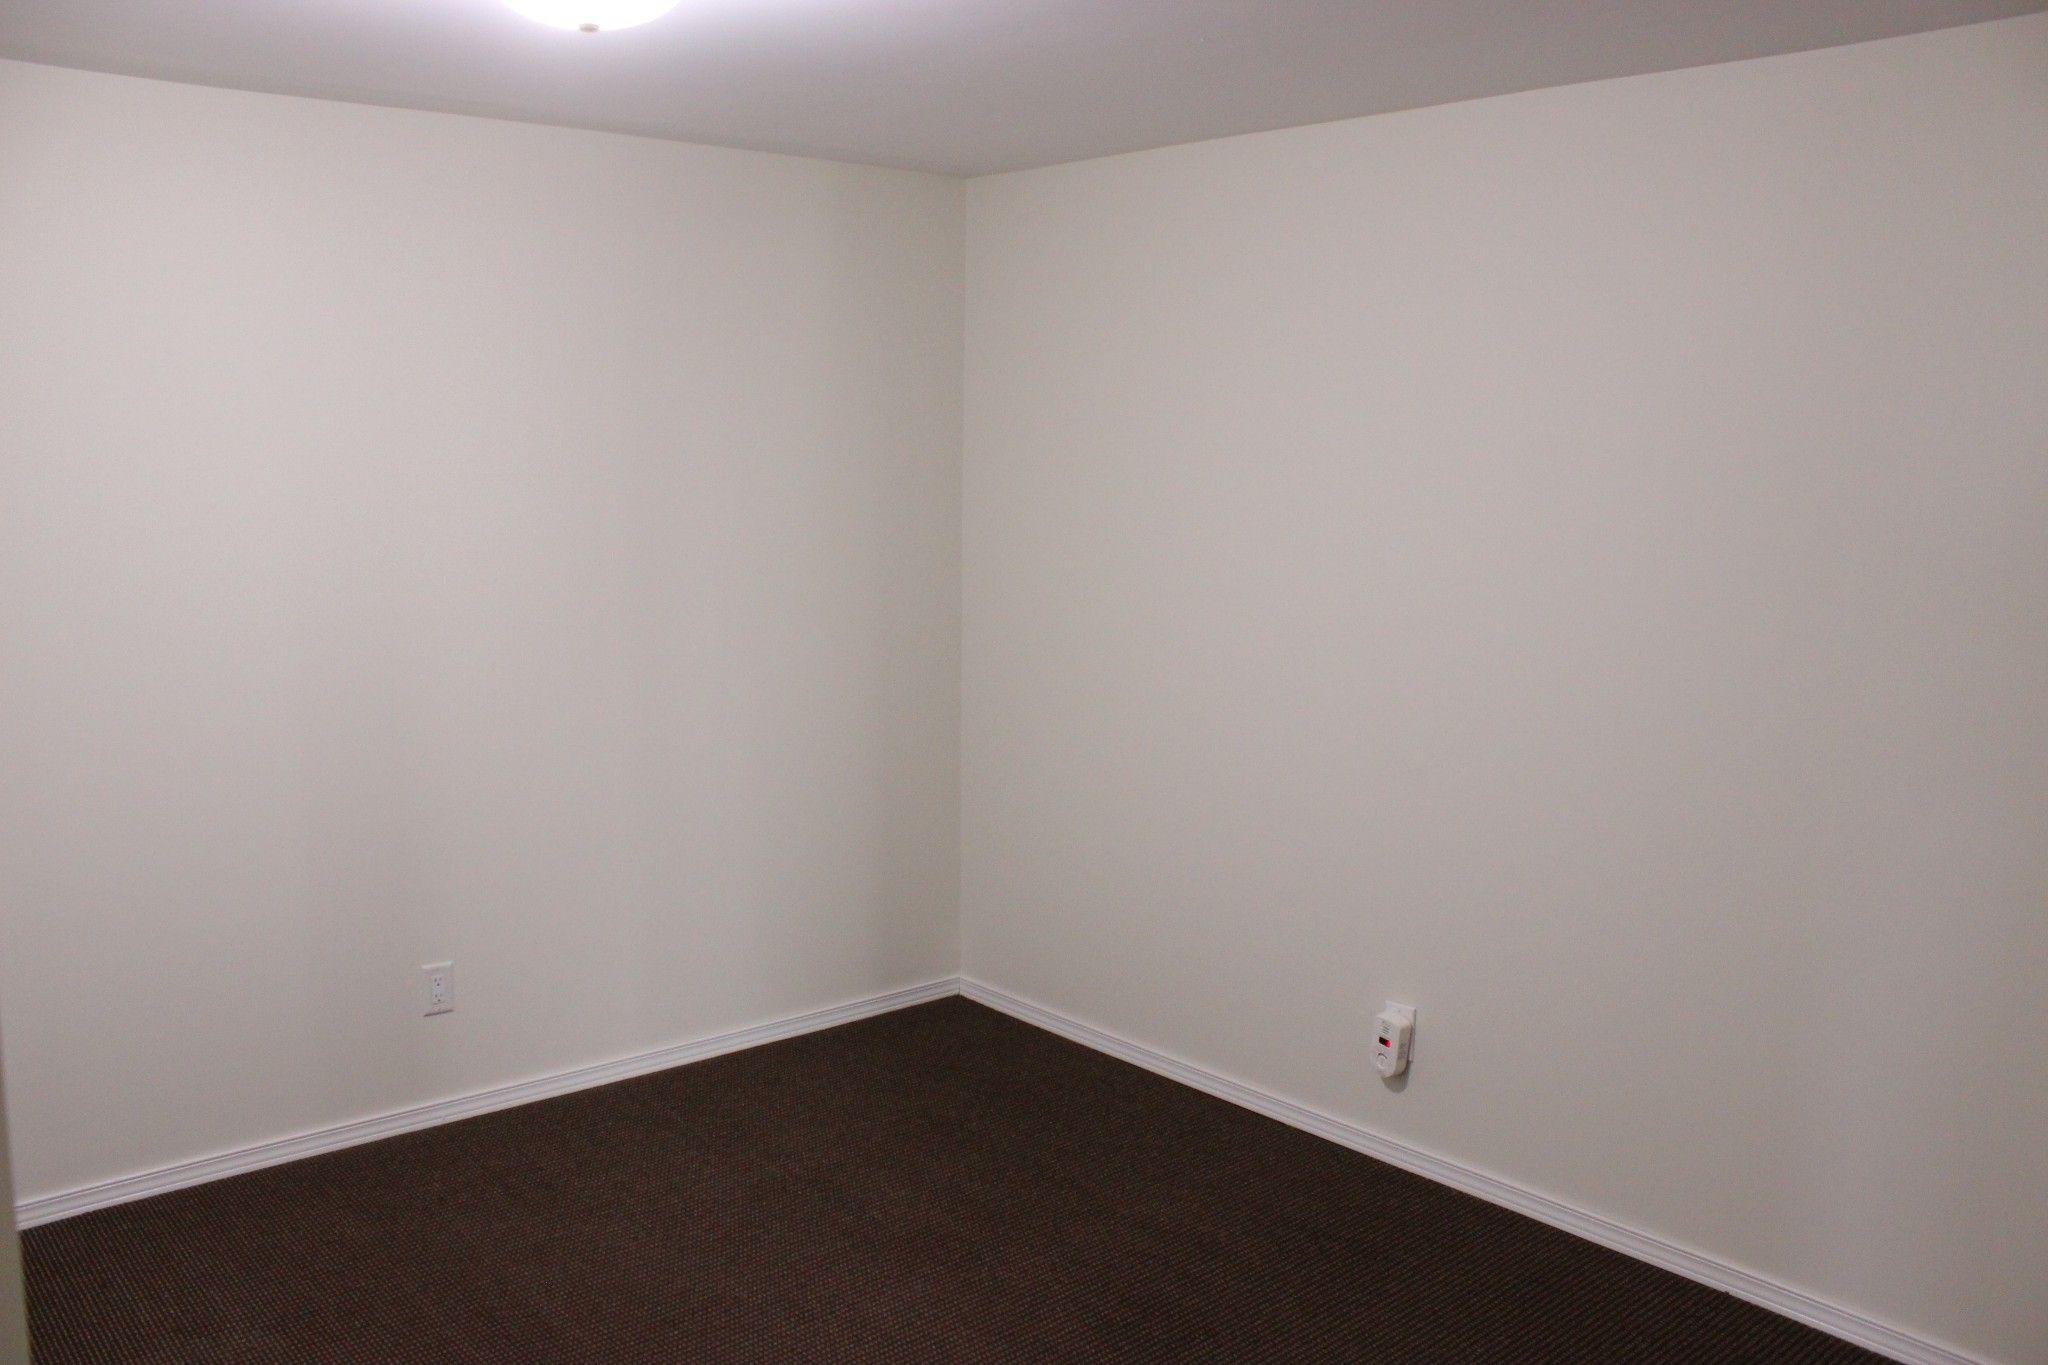 Photo 16: Photos: 317 Waddington Drive in Kamloops: Sahali 1/2 Duplex for sale : MLS®# 161942